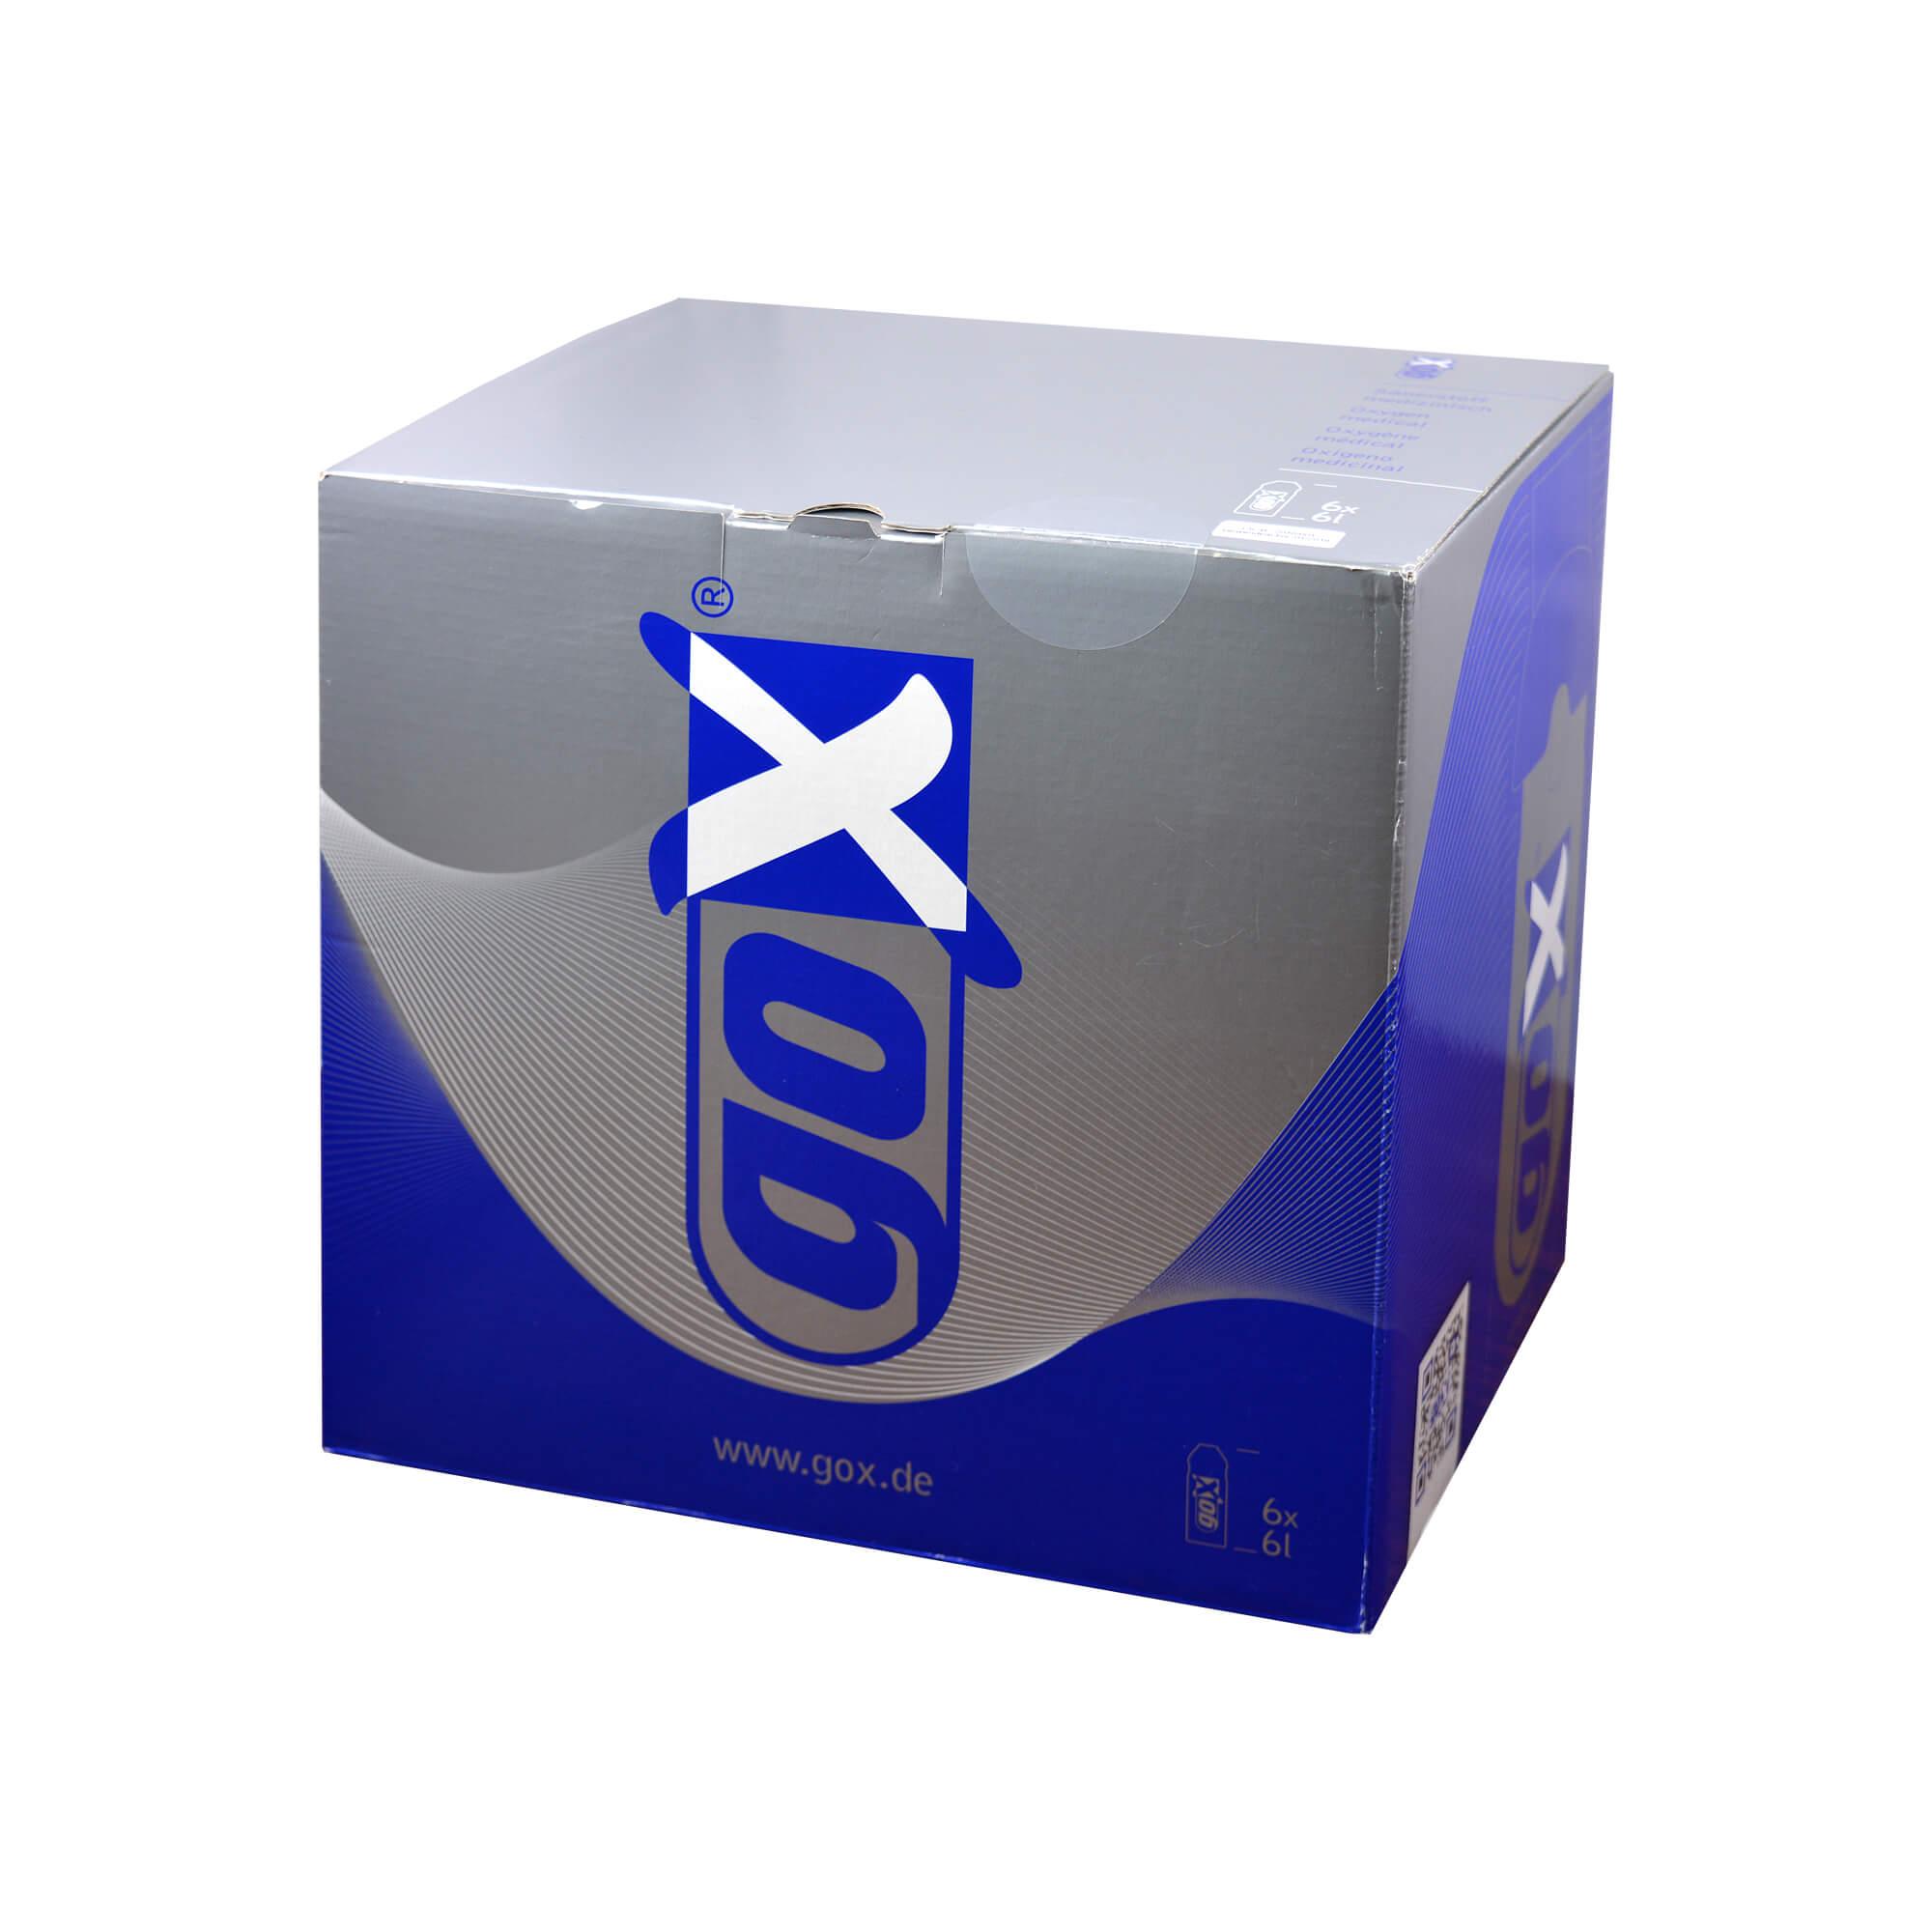 Gox Sauerstoff Medizin.Zwecke Sixpack